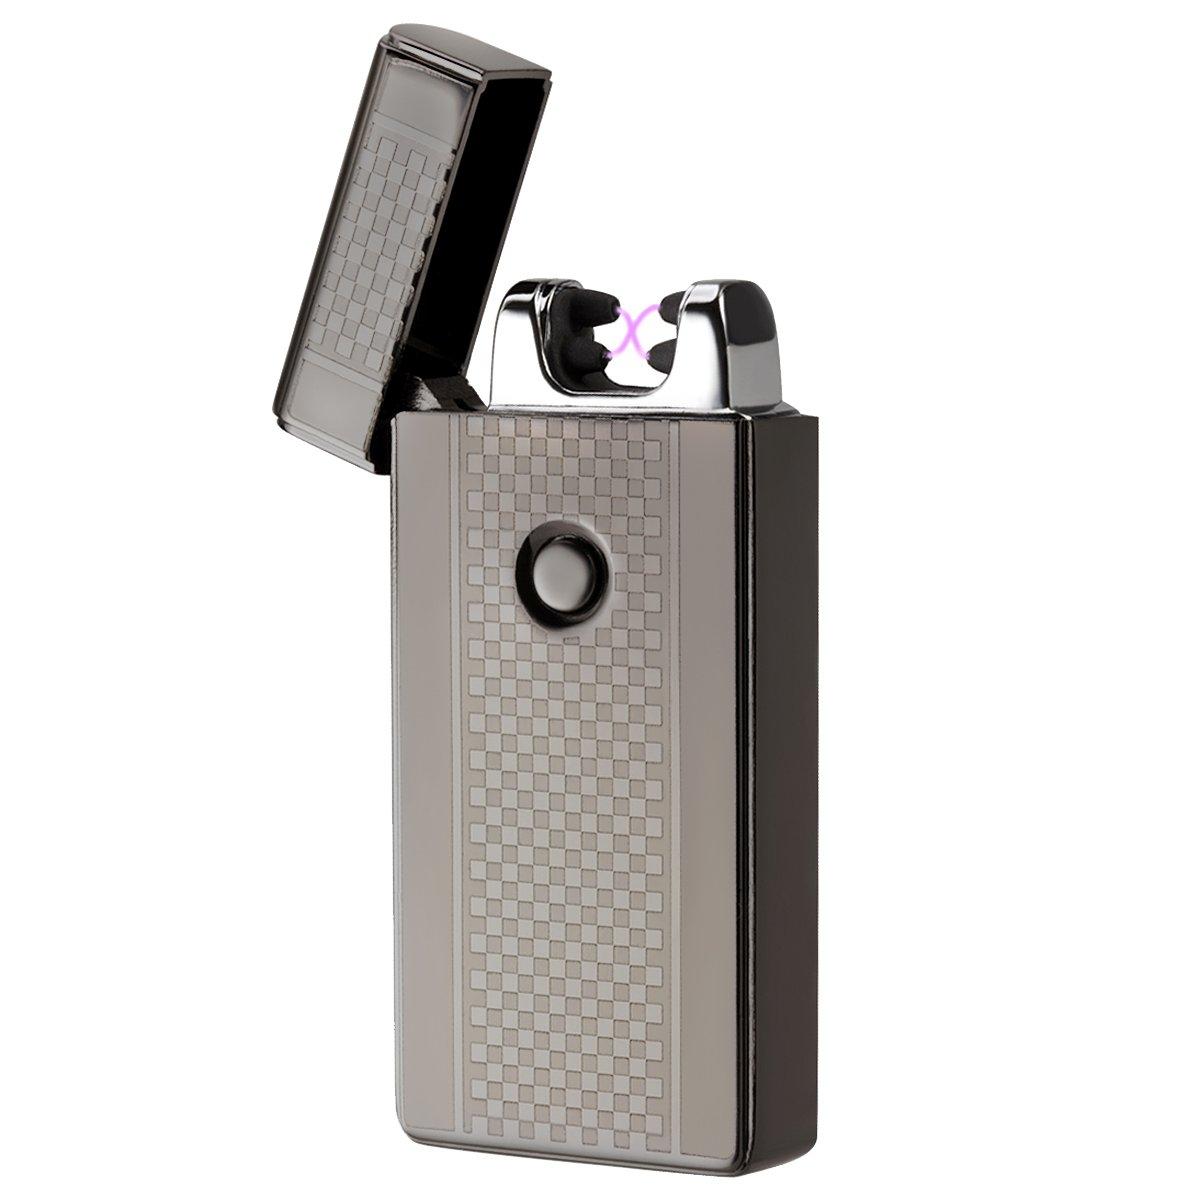 AKUNSZ Mechero Eléctrico, USB Encendedor Doble Arco Eléctricos (Más Avanzado)  Carga Rápida de